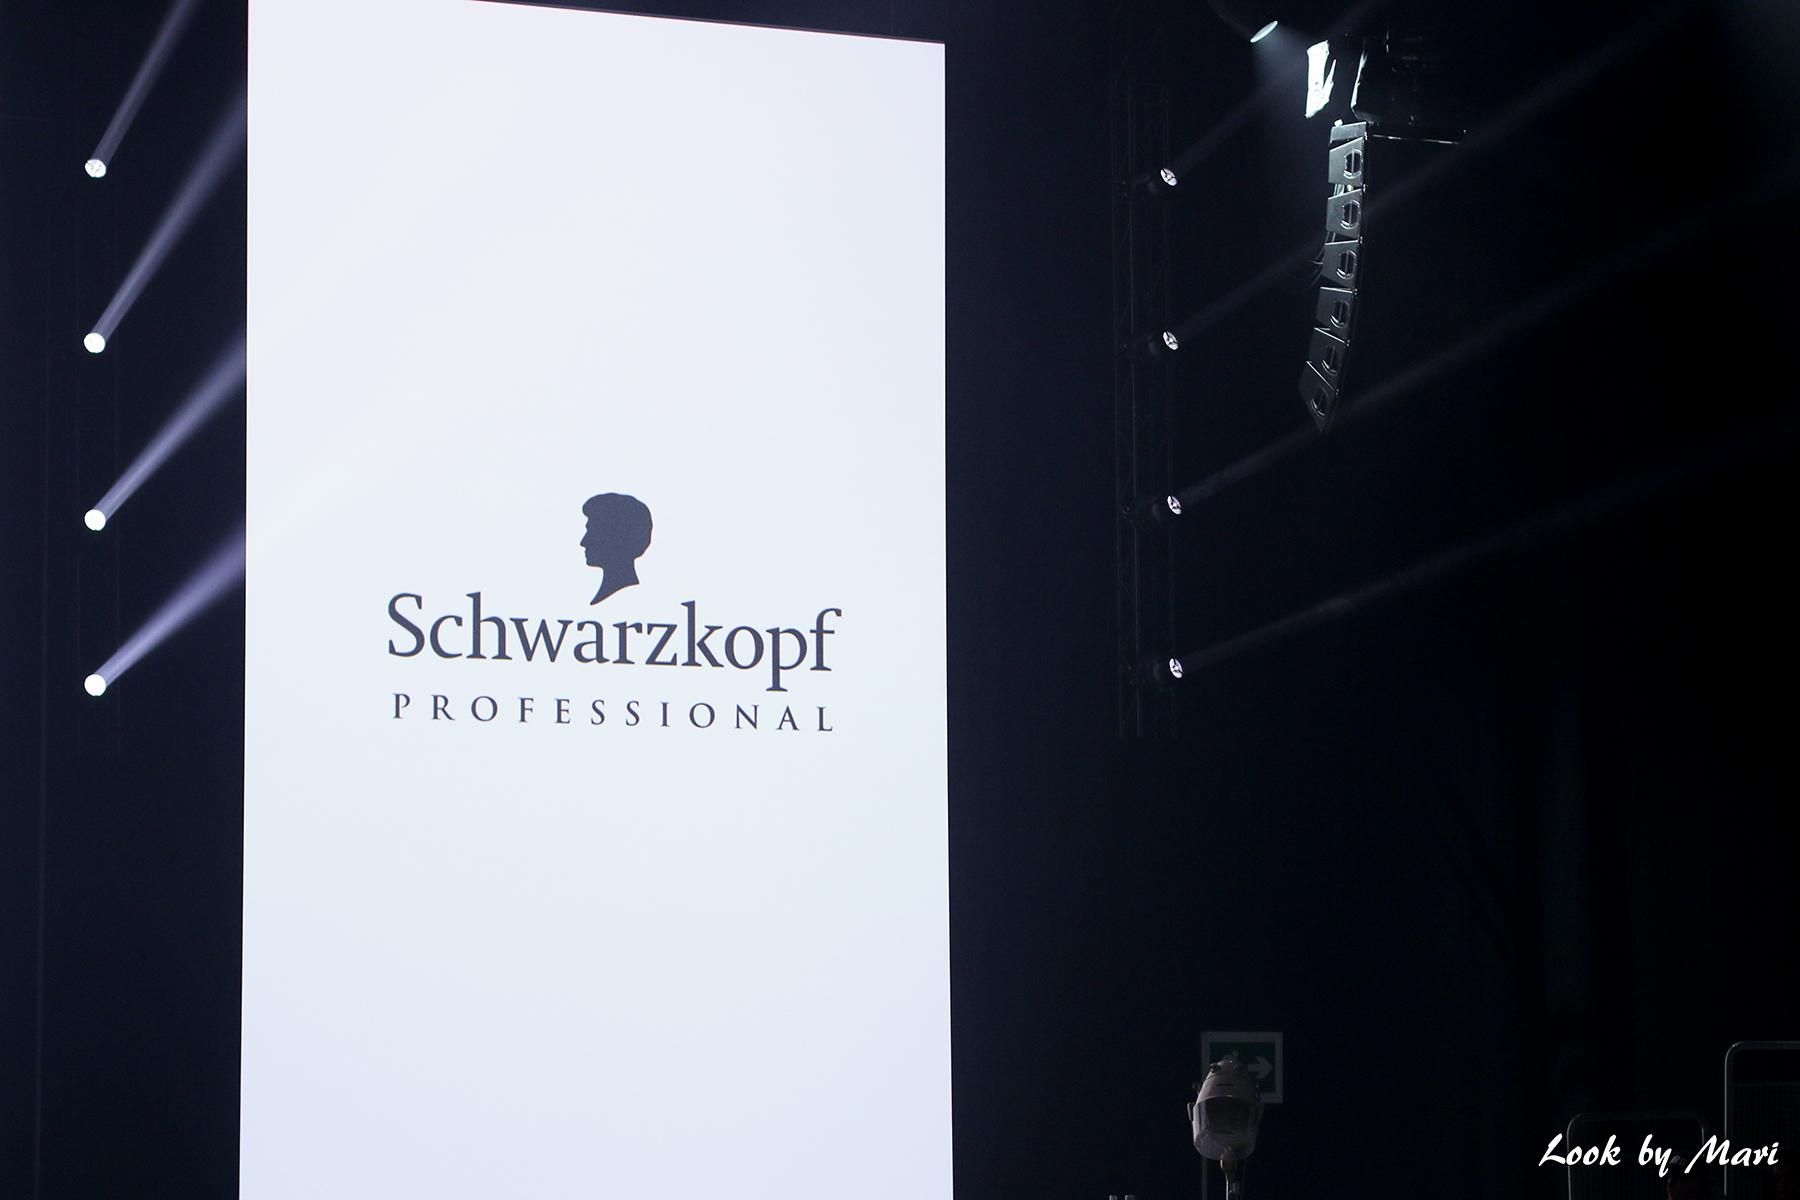 2 schwarzkopf professional finland pro show 20.10.2017